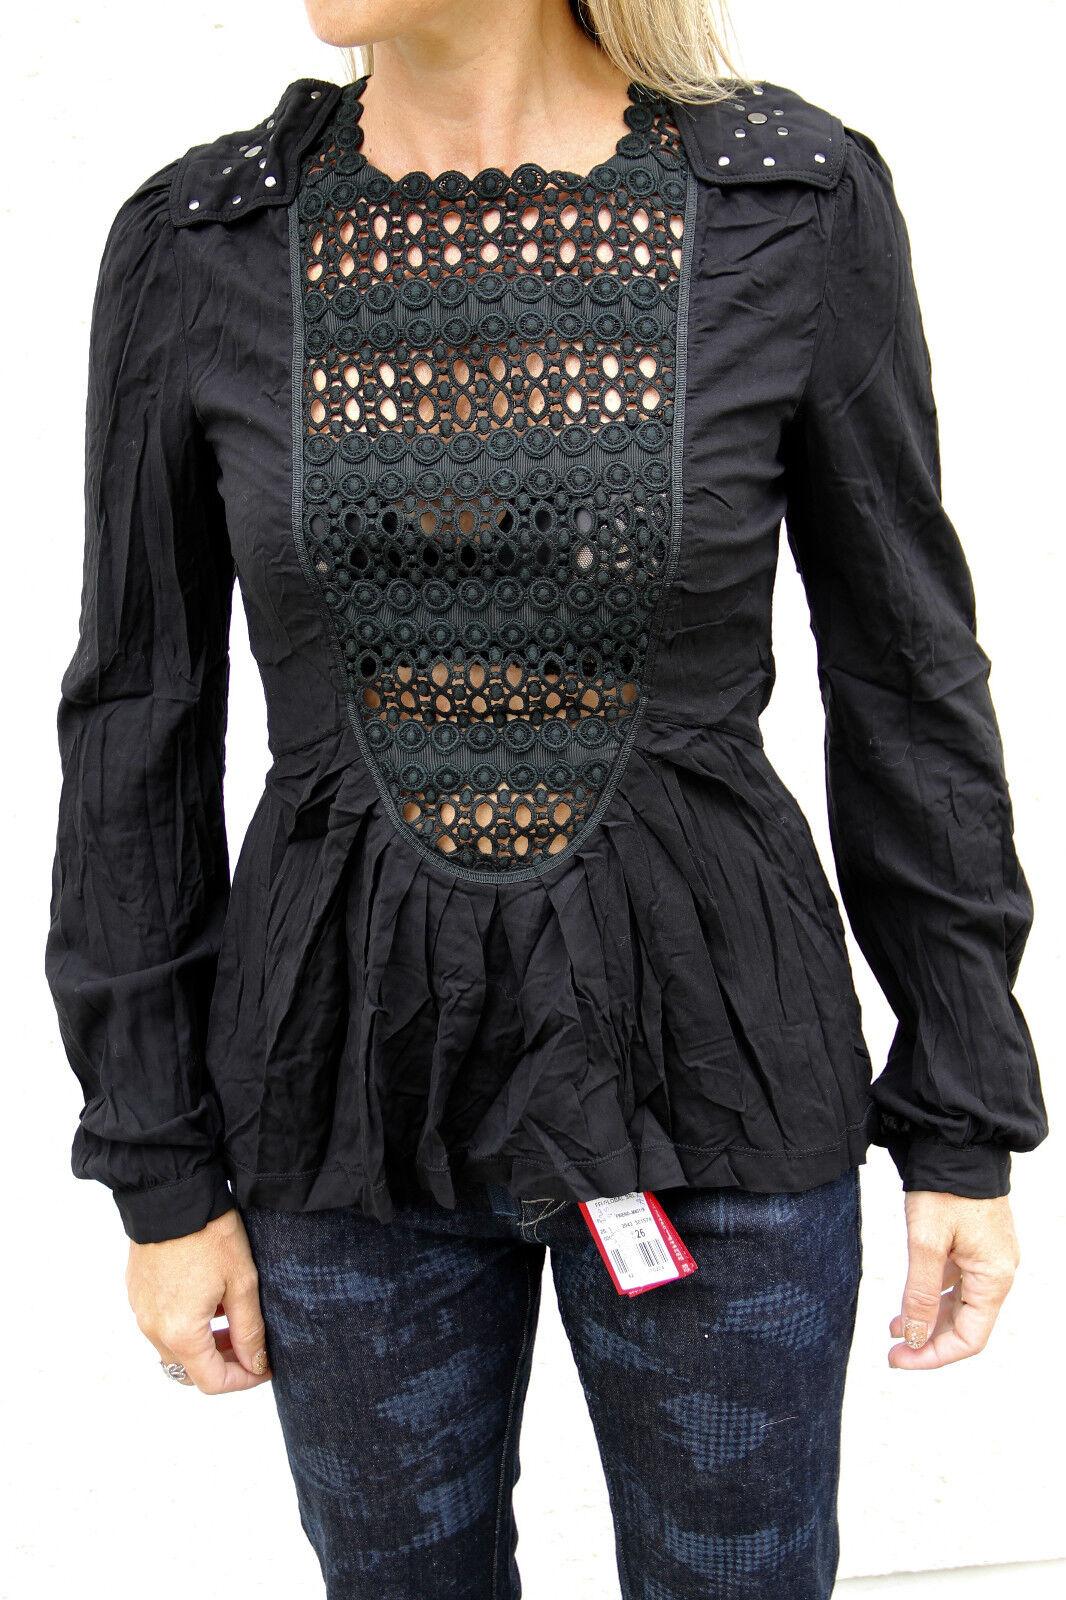 Magnifique tunique blouse viscose nero HIGH USE  Dimensione 38 NEUF ÉTIQUETTE